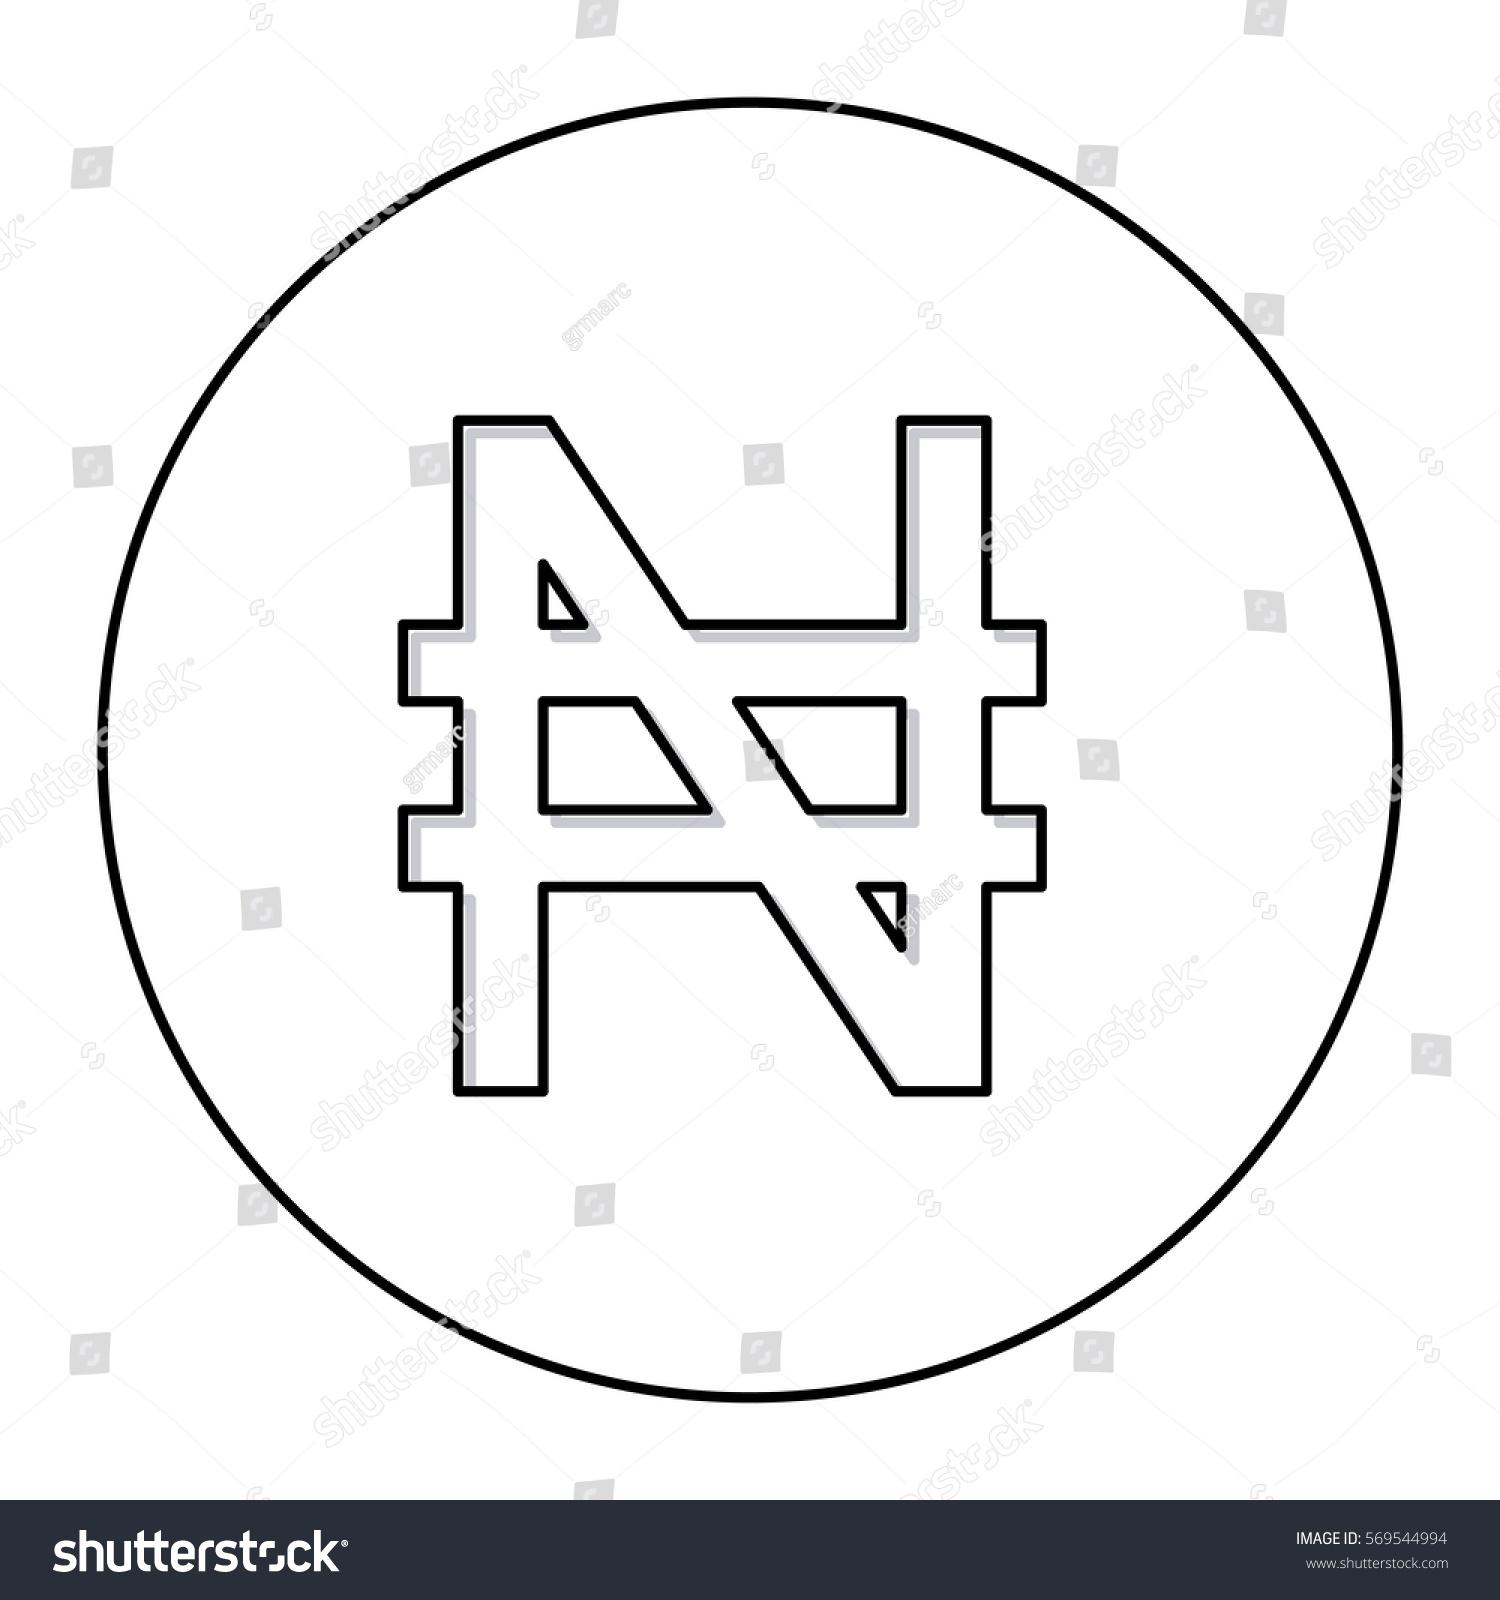 Monochrome Contour Currency Symbol Nigerian Naira Stock Vector